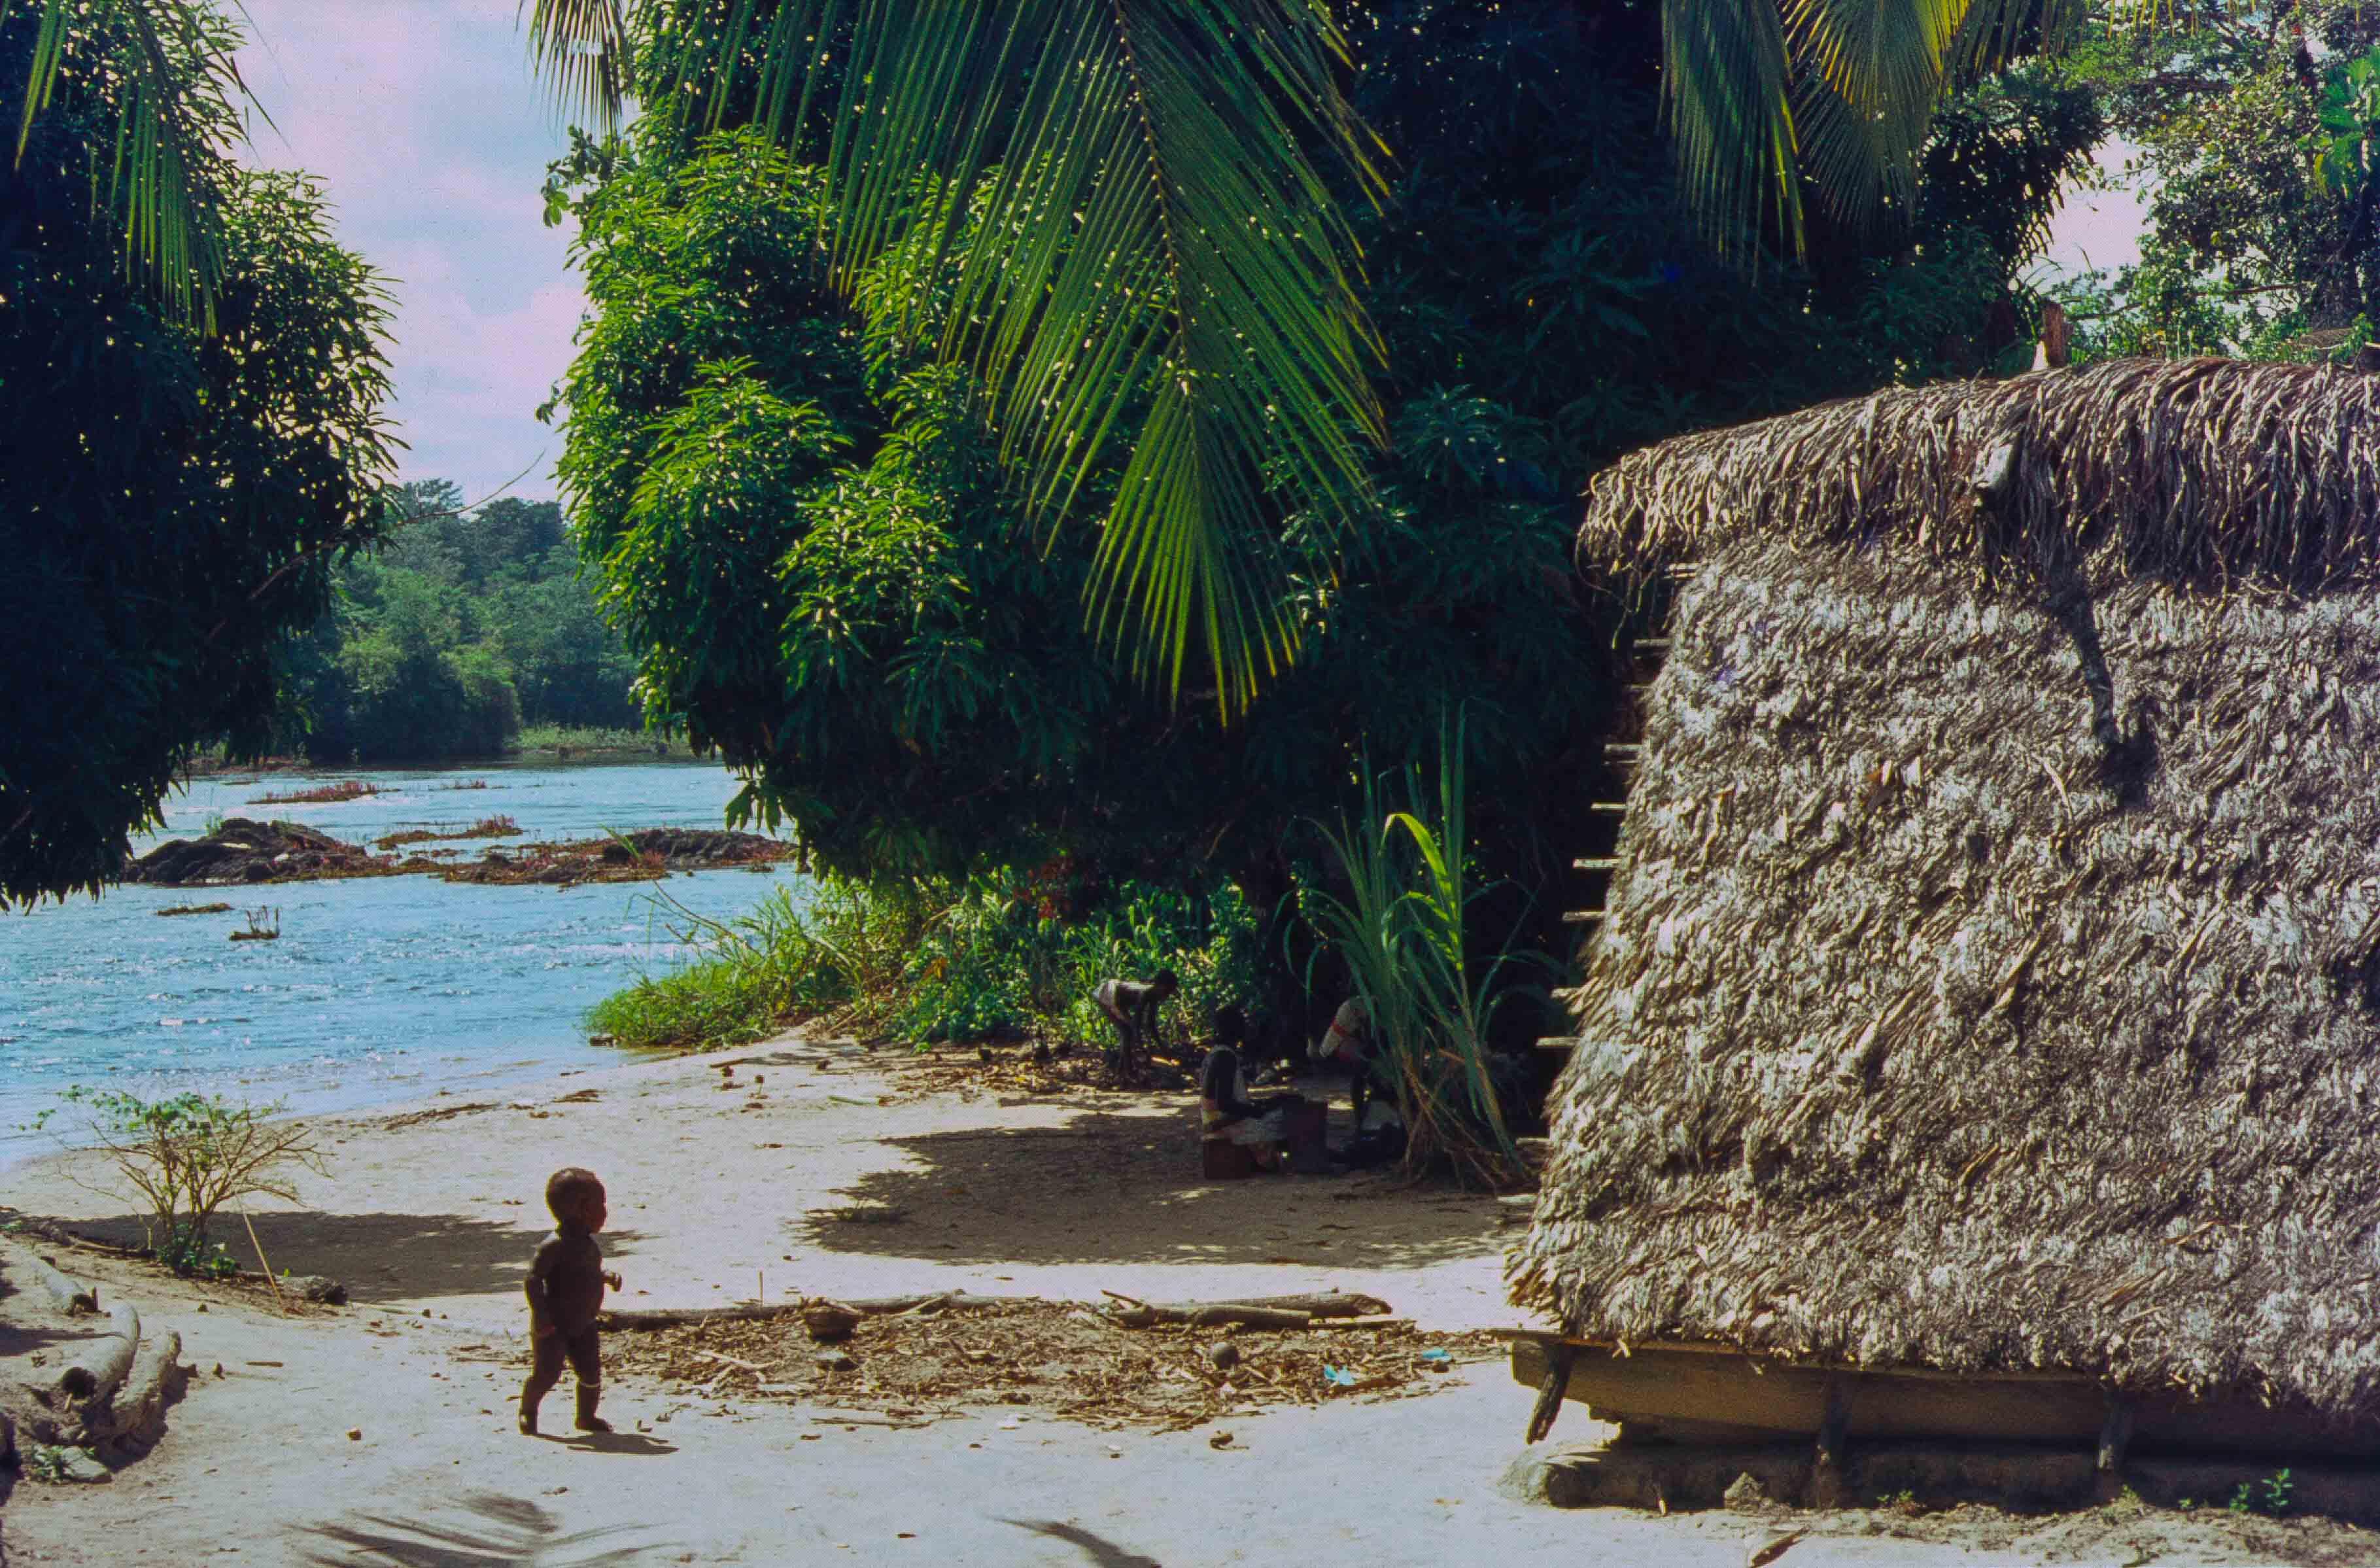 477. Suriname